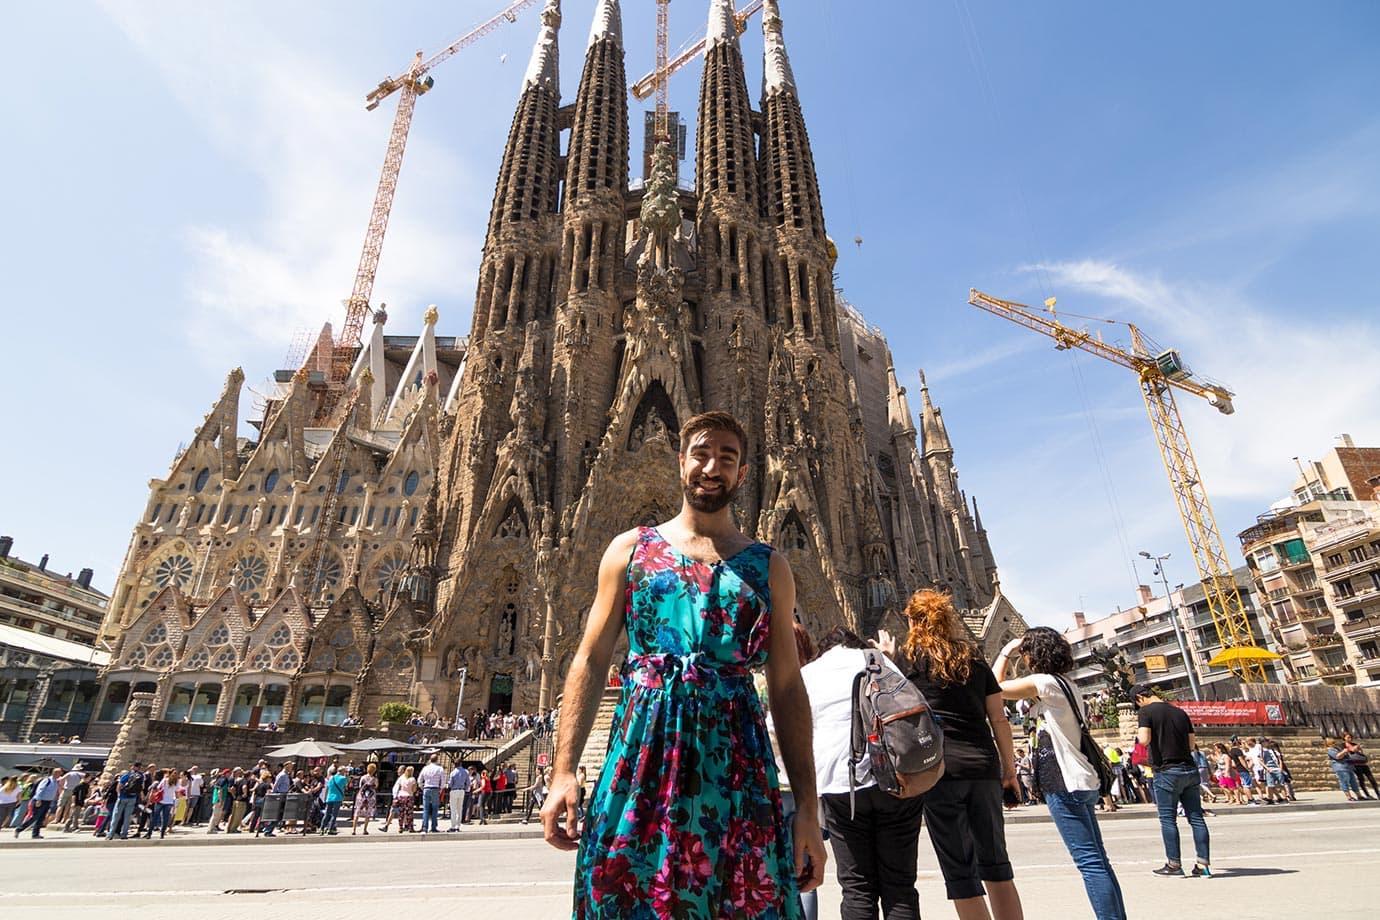 Standing outside the Sagrada Familia